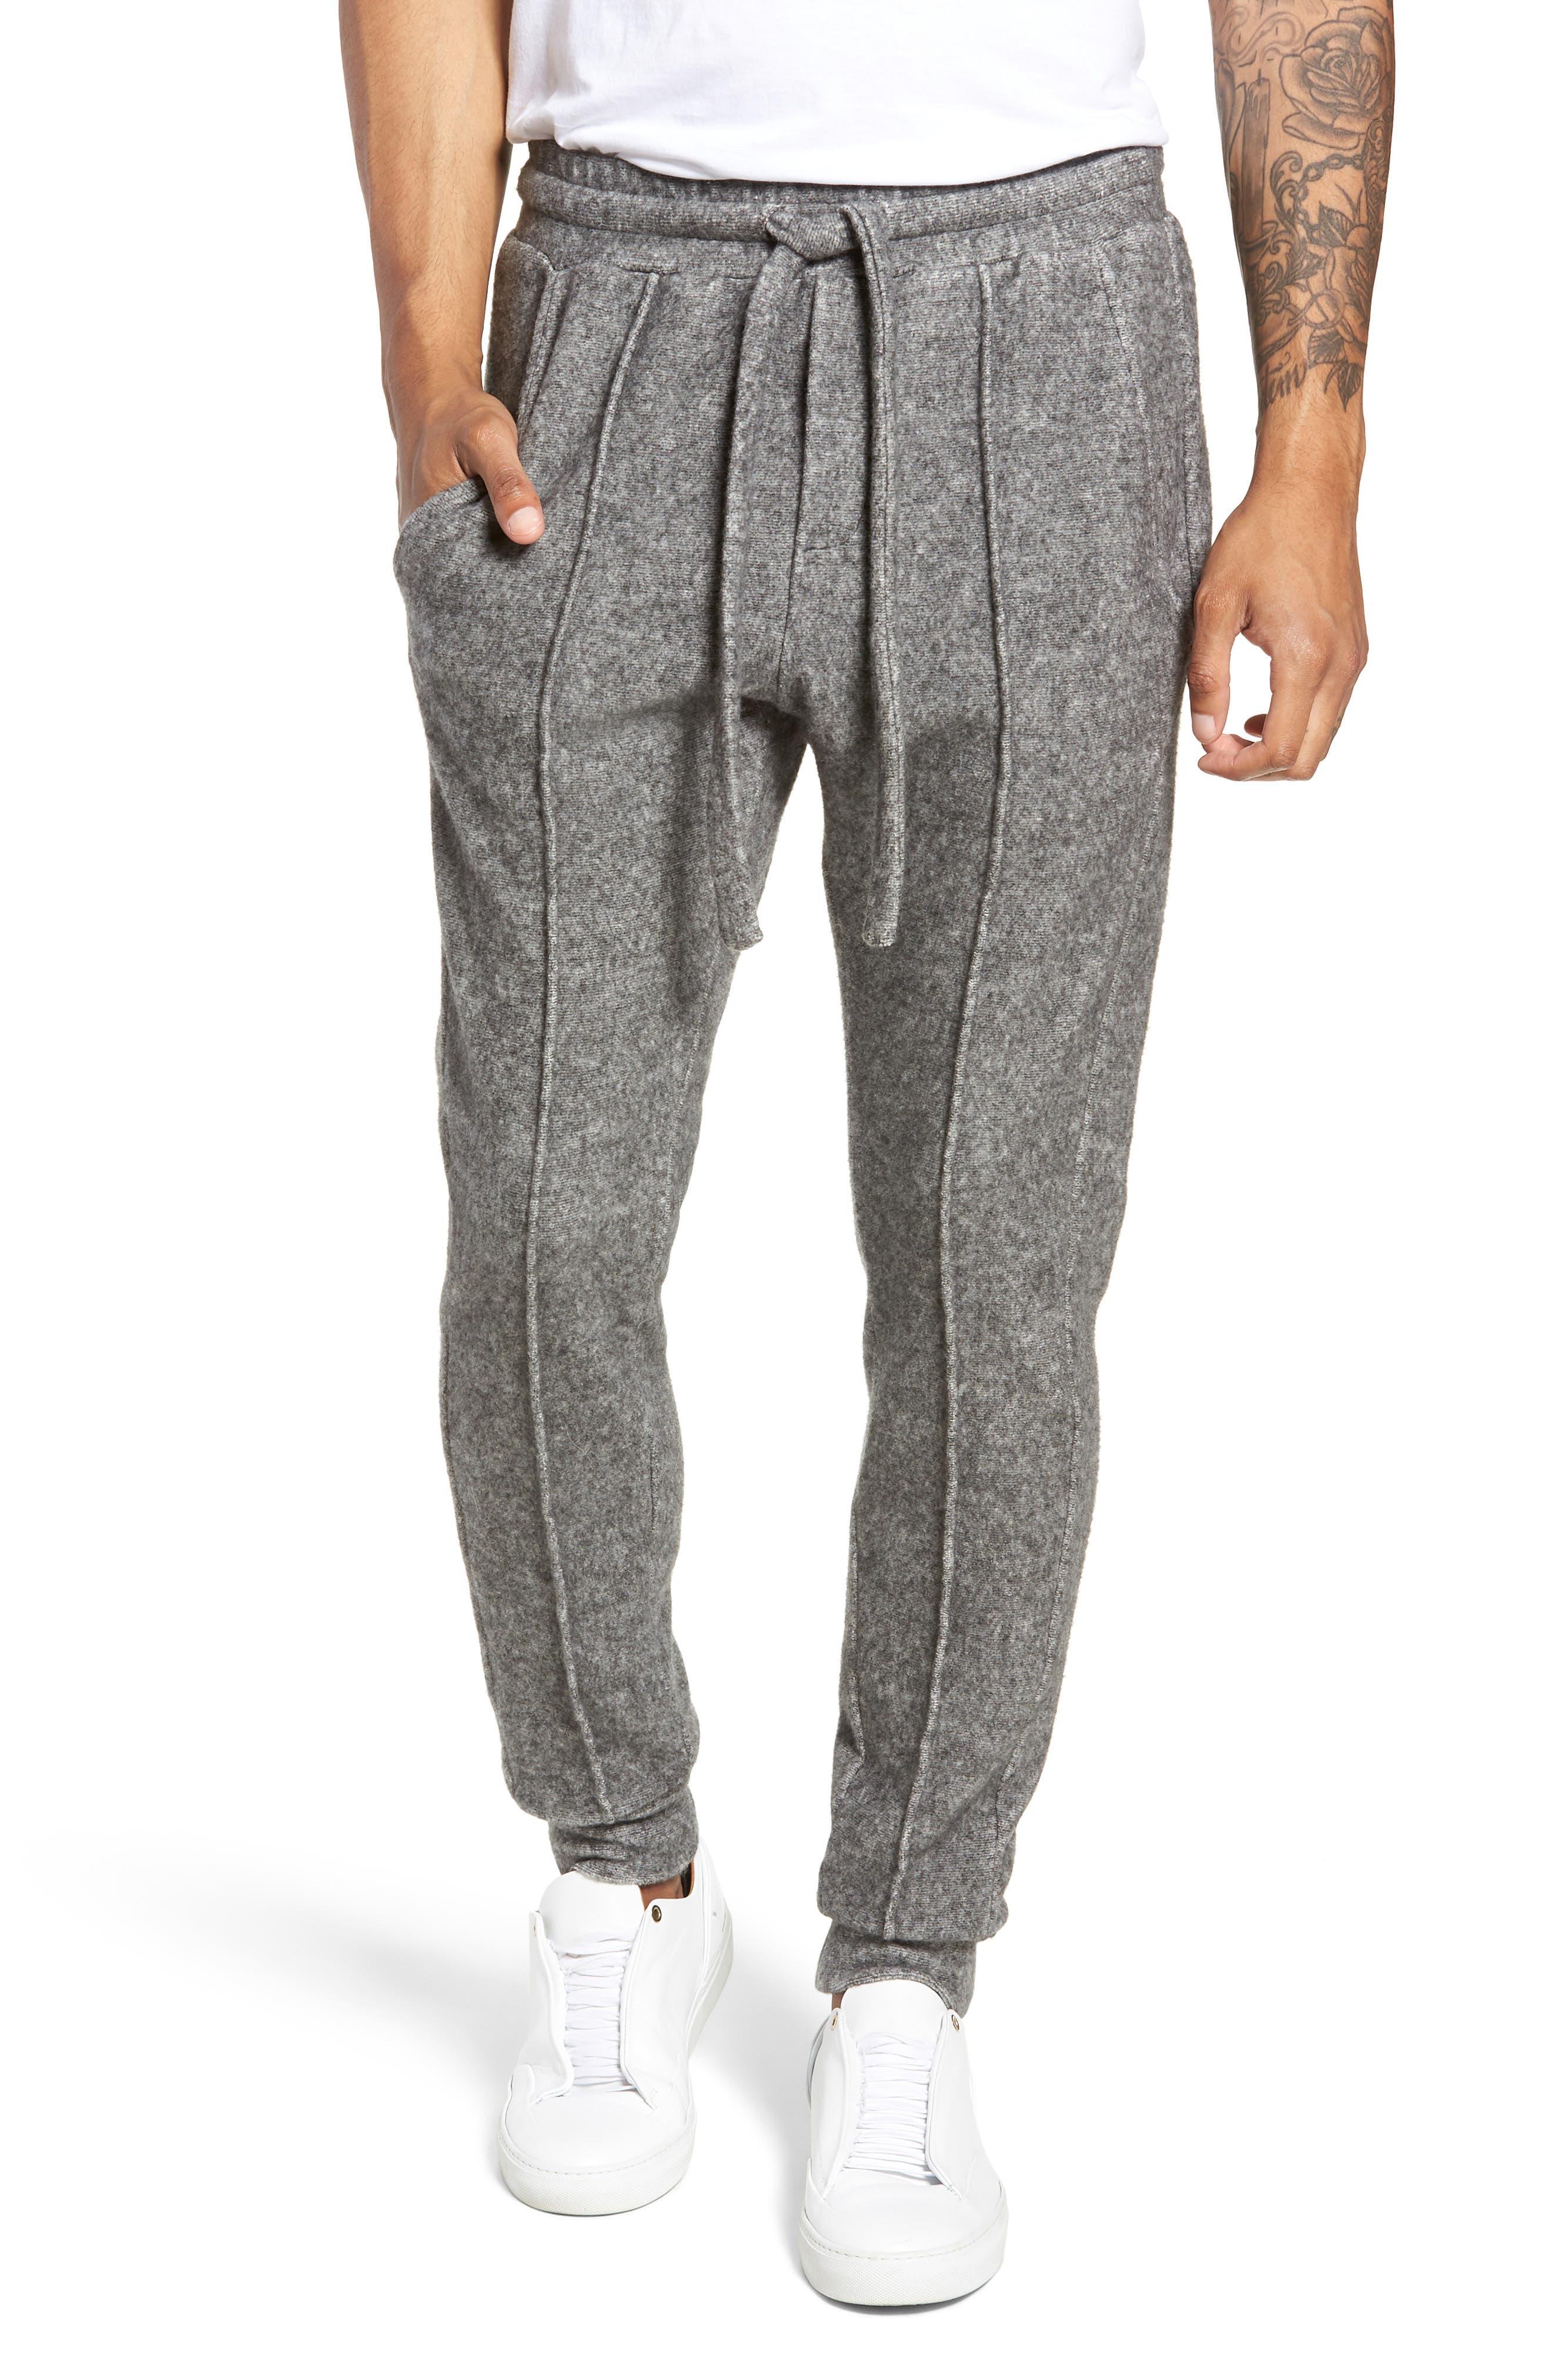 Maddux Slim Fit Jogger Pants,                         Main,                         color, HEATHER GREY